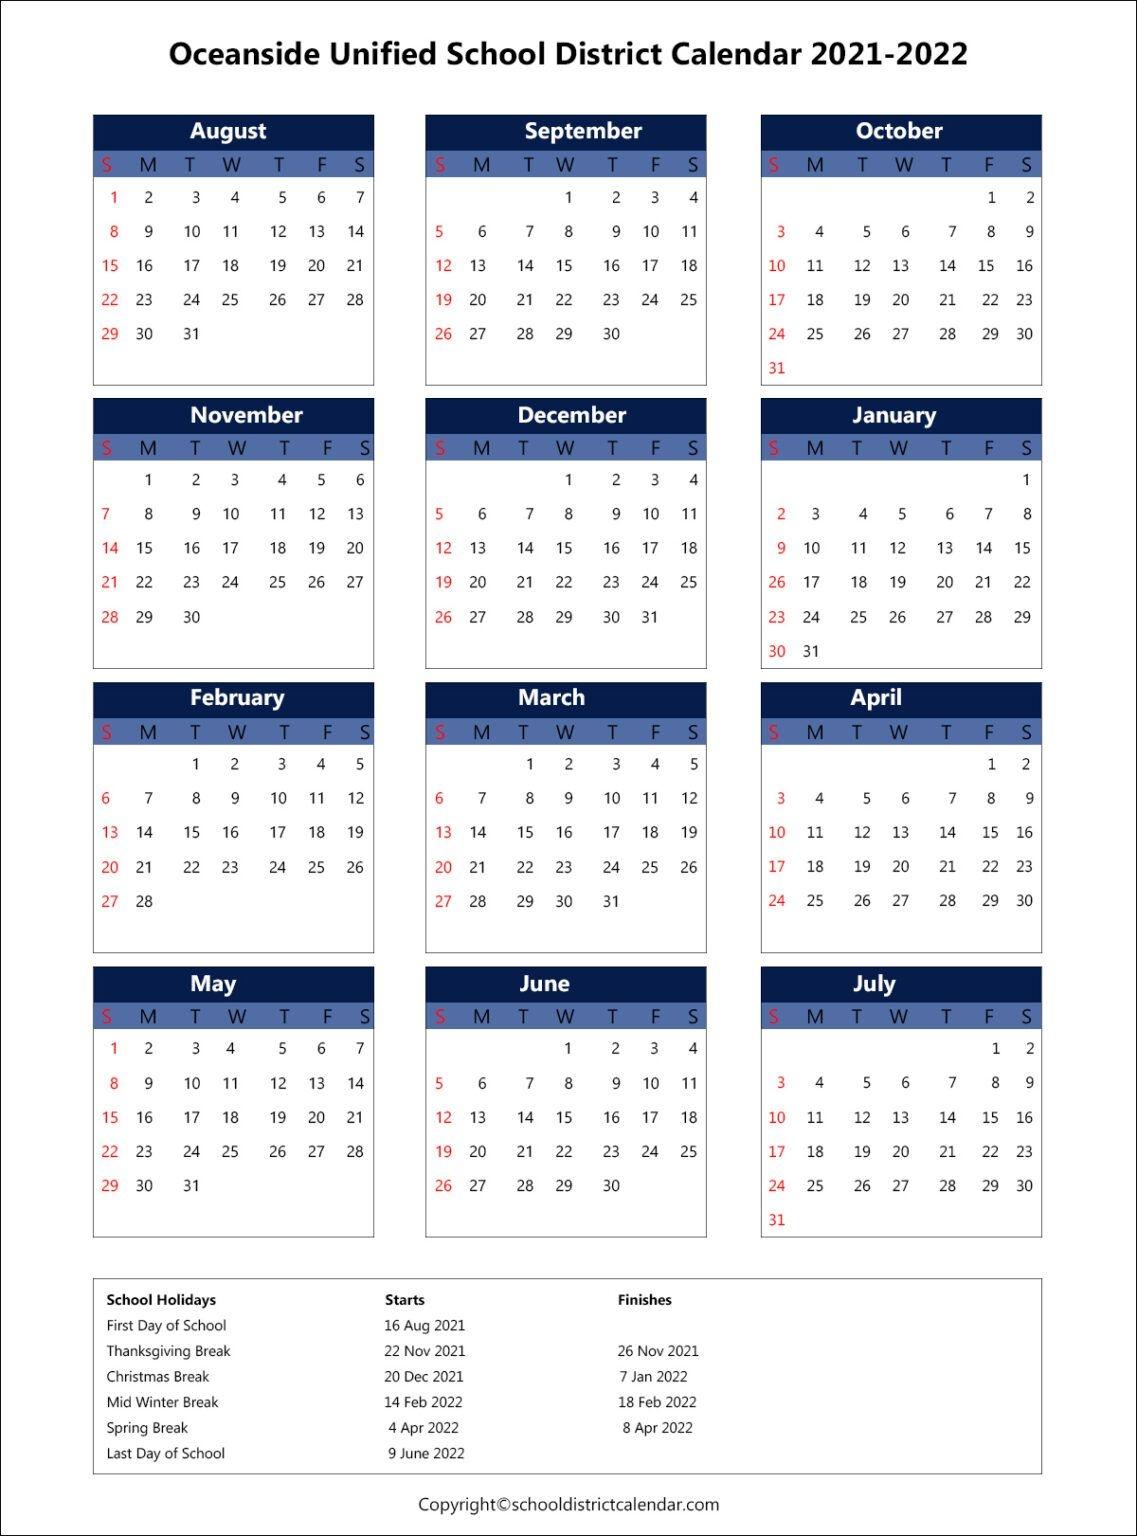 Oceanside Unified School District Calendar Holidays 2021-2022